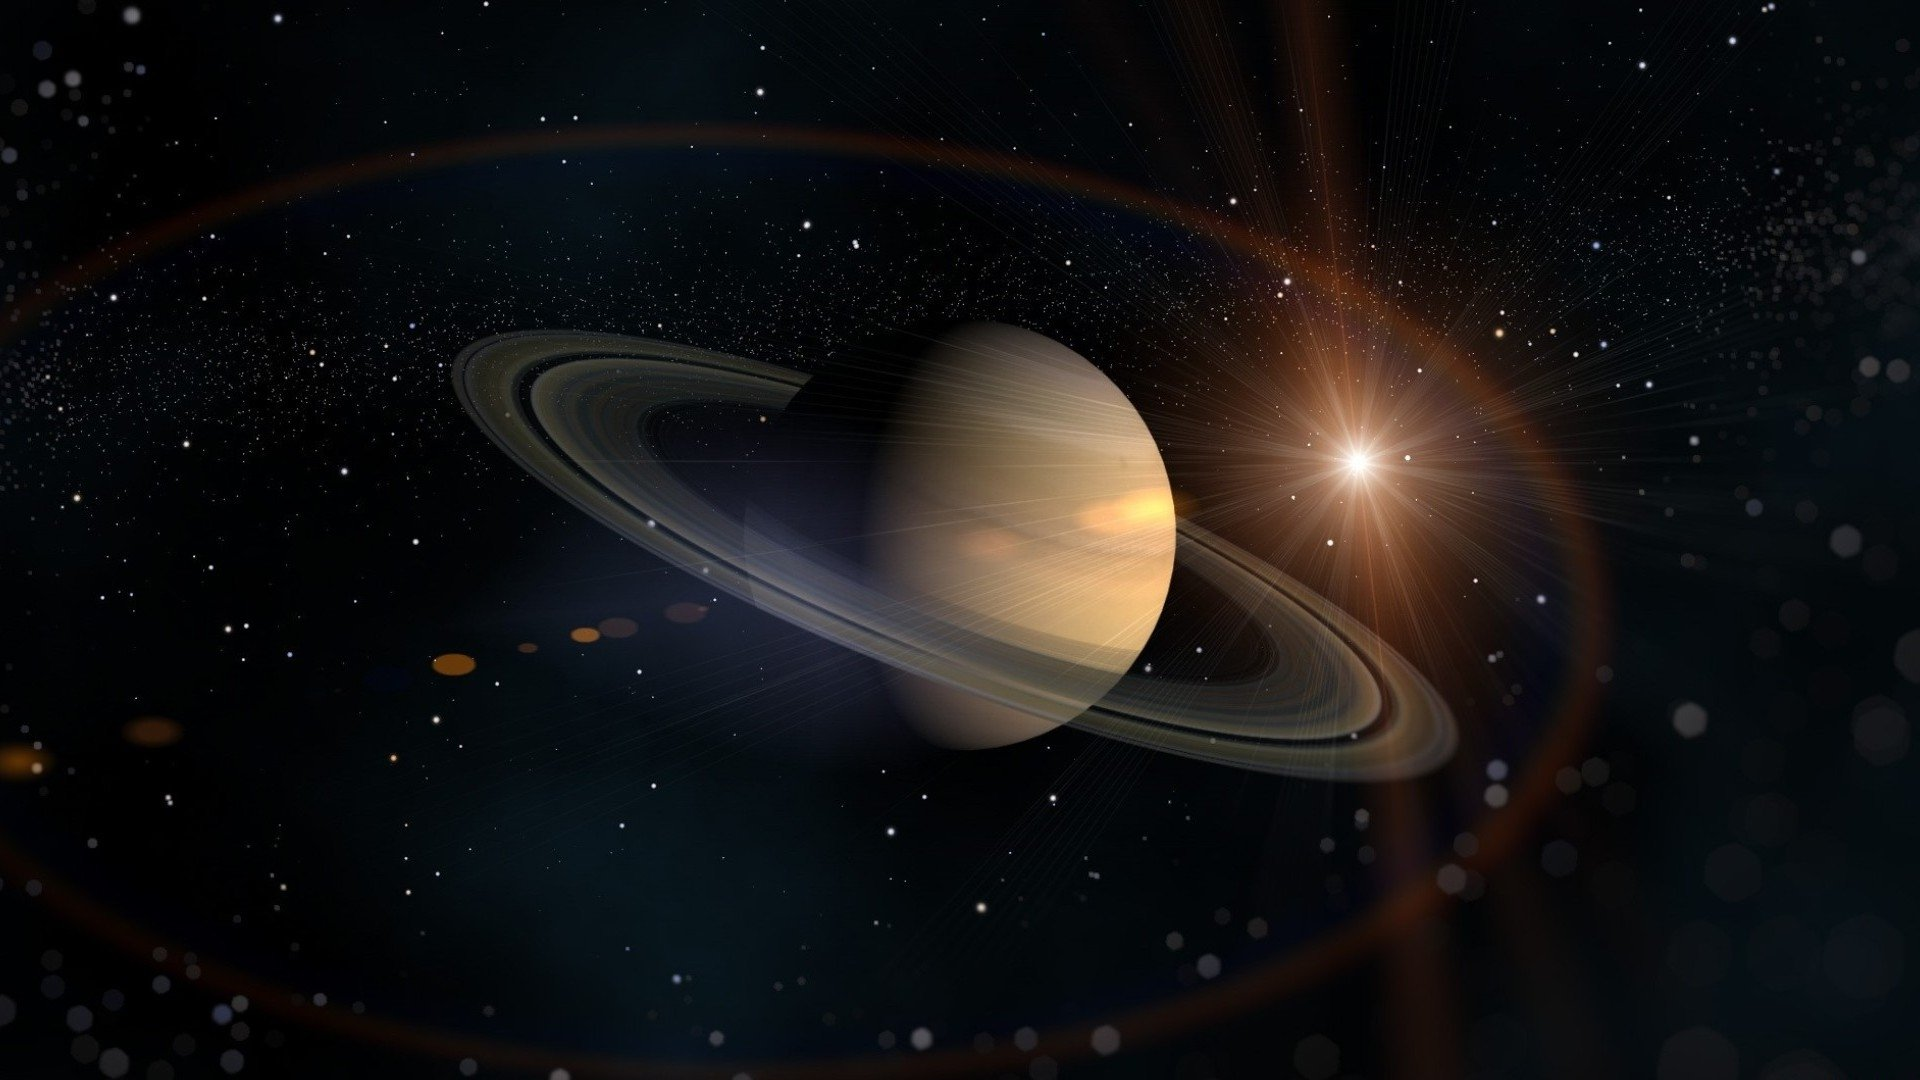 Saturn Hd Wallpaper Background Image 1920x1080 Id